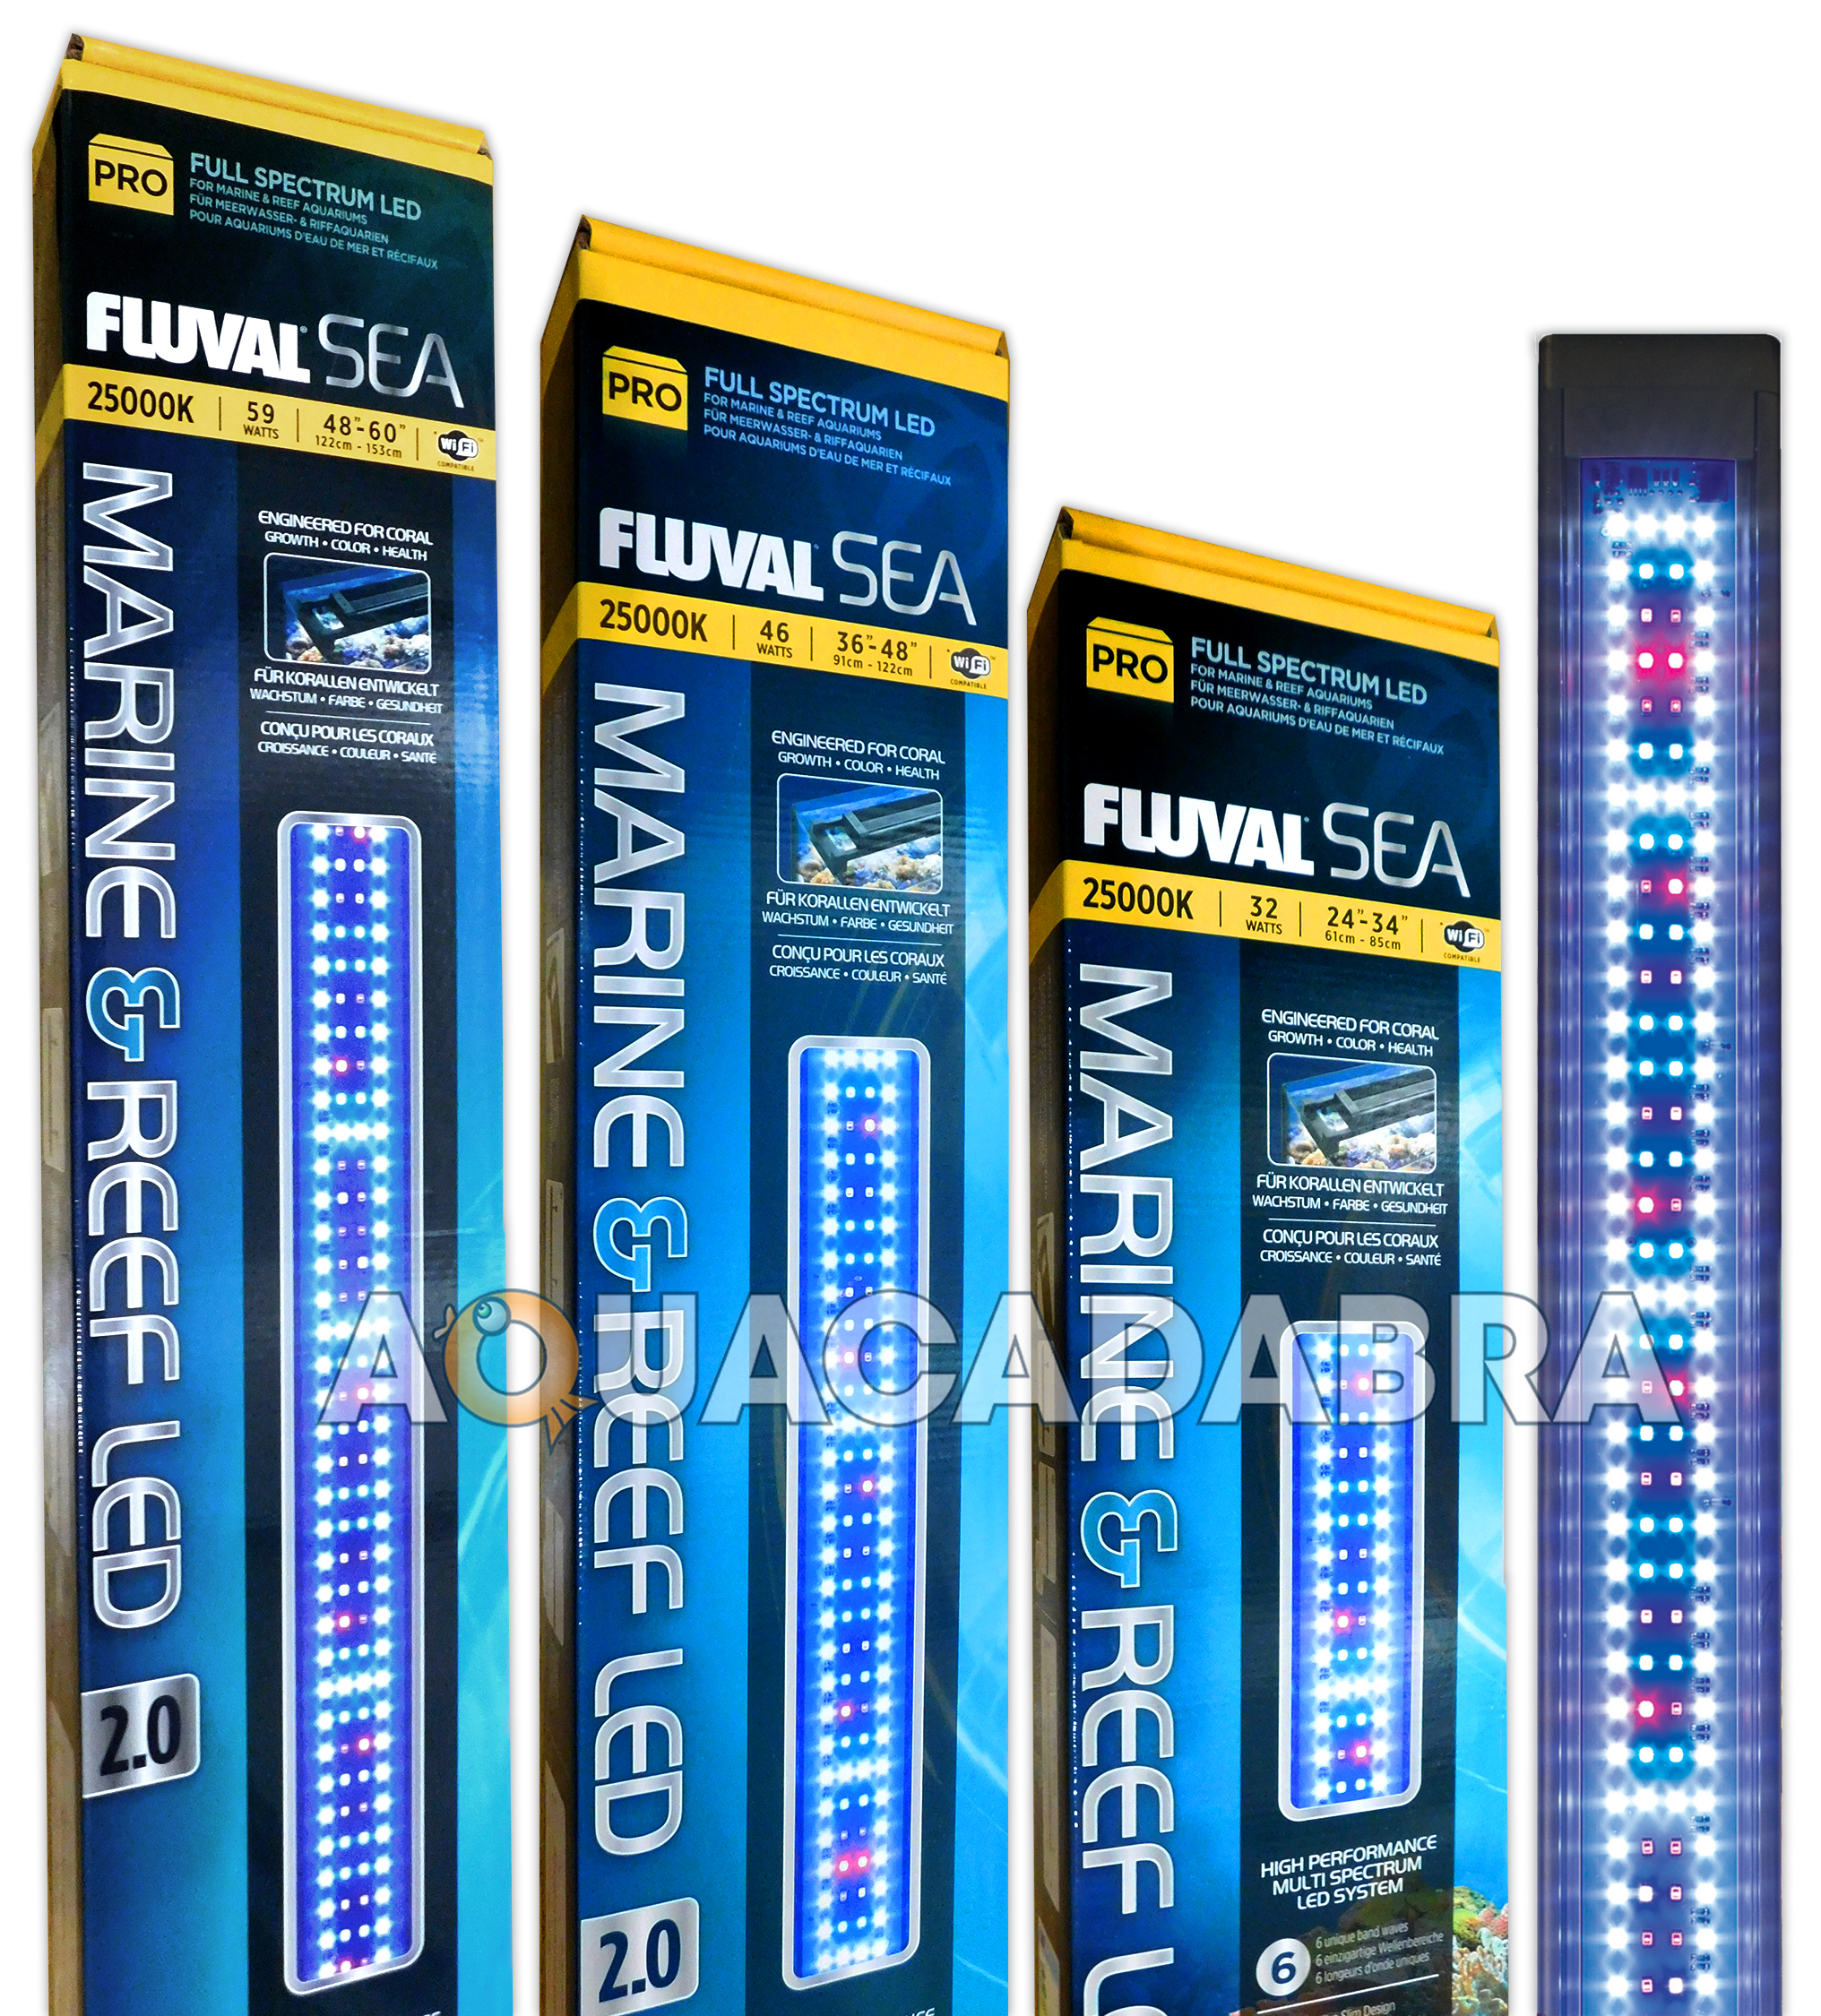 Fluval Marine Amp Reef Led 2 0 Lighting Spectrum Waterproof